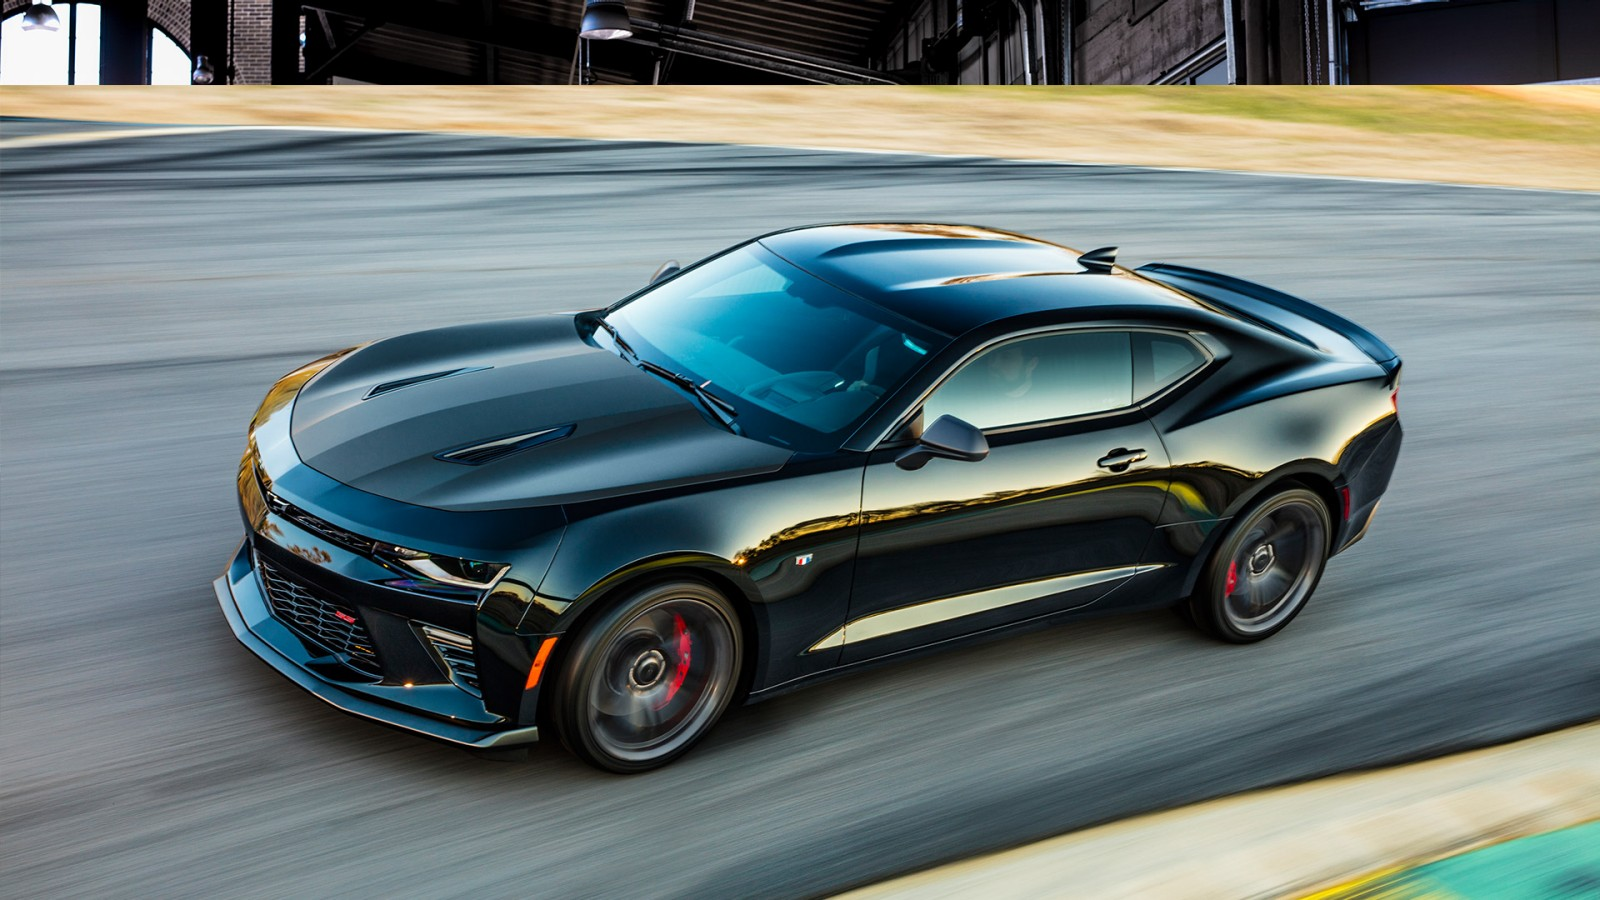 Chevrolet Camaro Lease Deals & Price   Jeff Wyler   Louisville KY